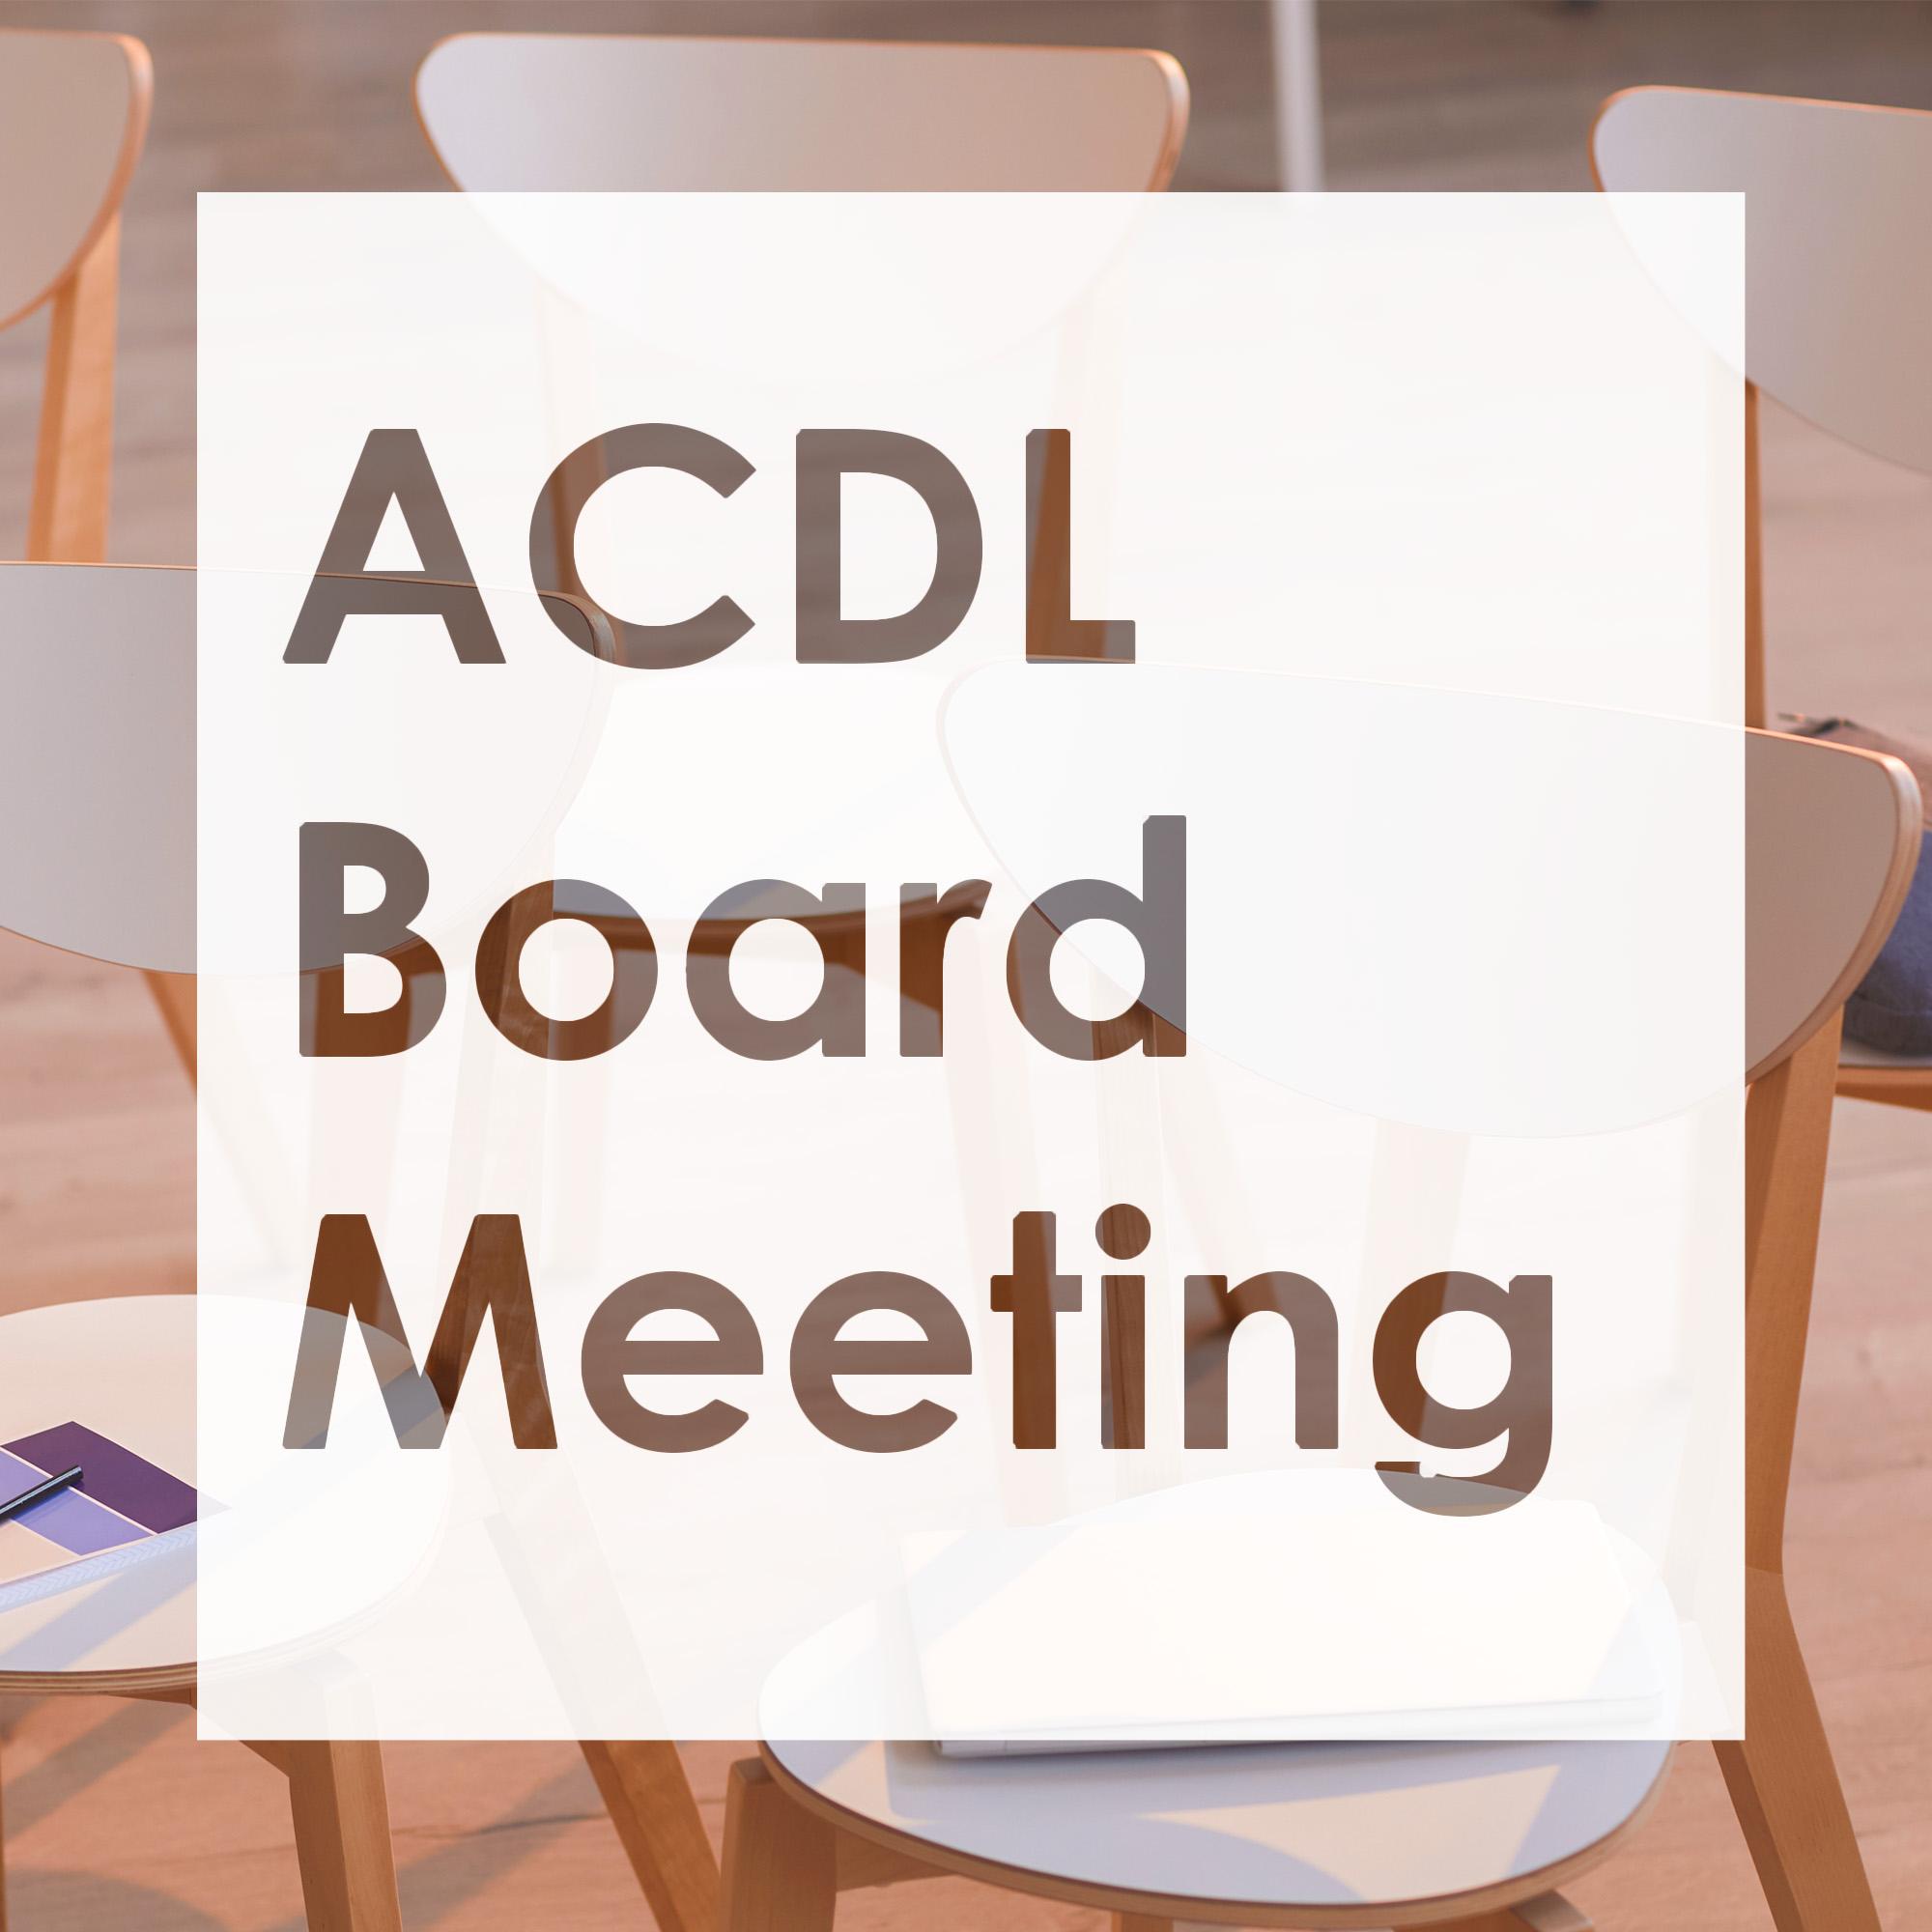 ACDL Board of Trustees meeting